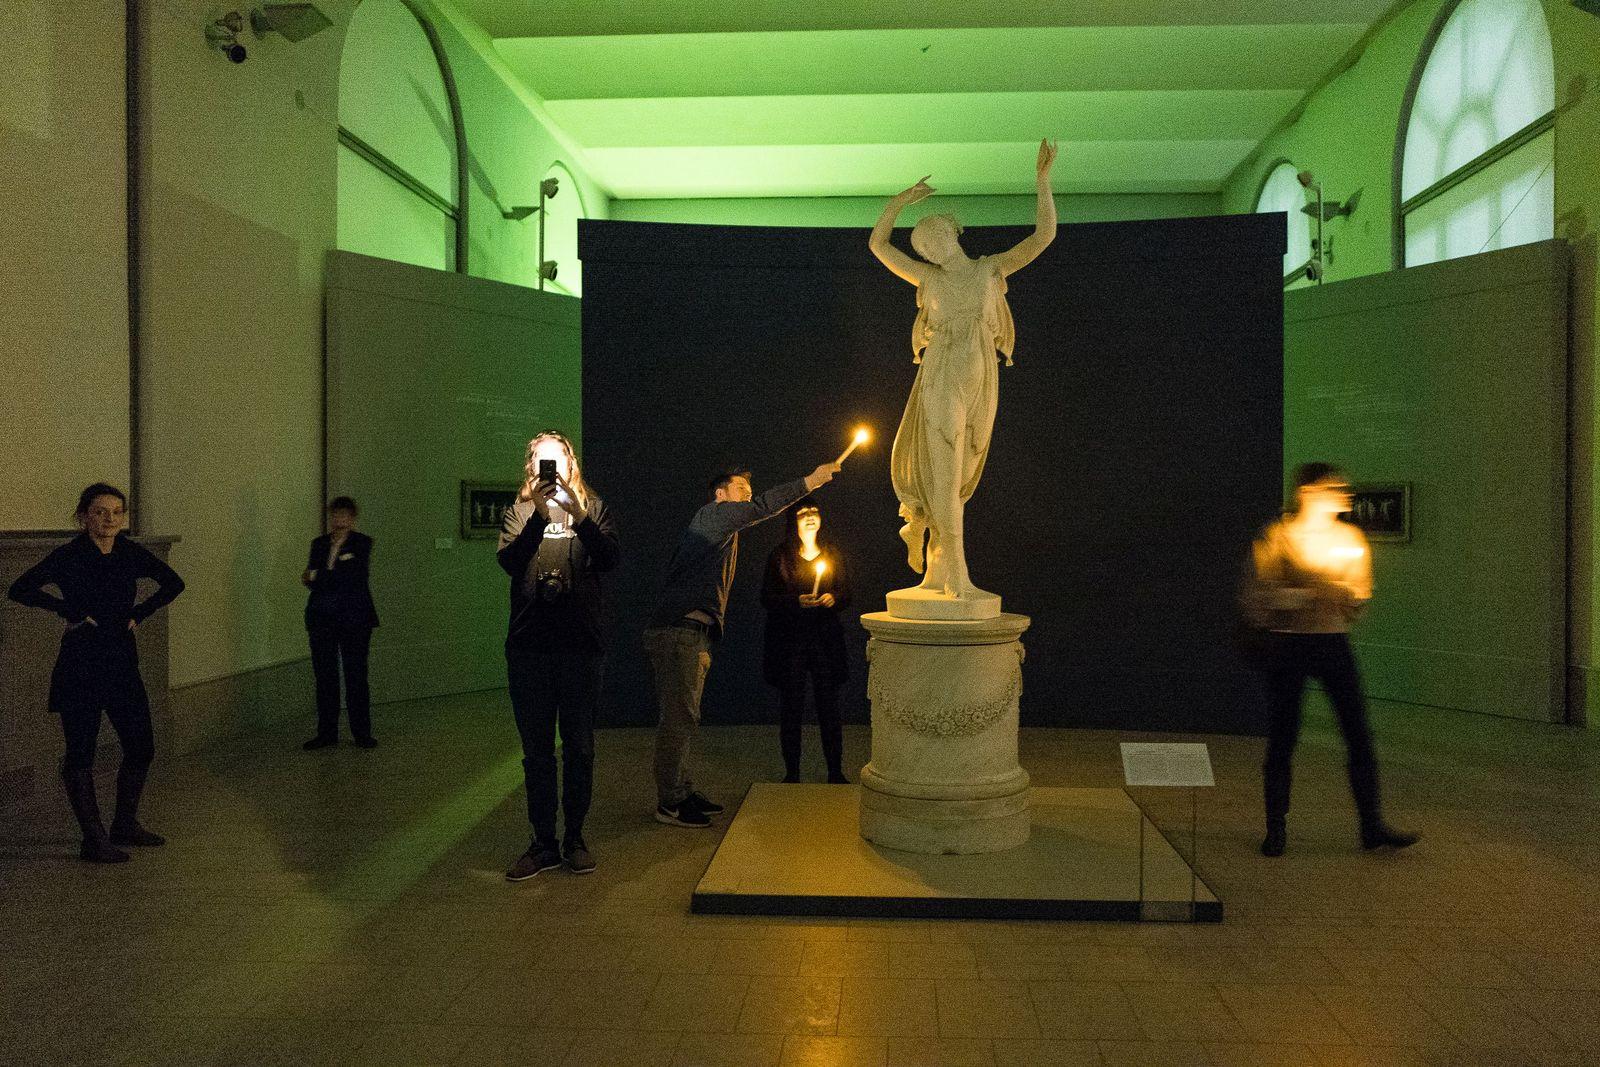 Das Kerzenlicht eröffnet neue Perspektiven auf den Marmor. Foto: Christoph Neumann, www.christoph-neumann.com